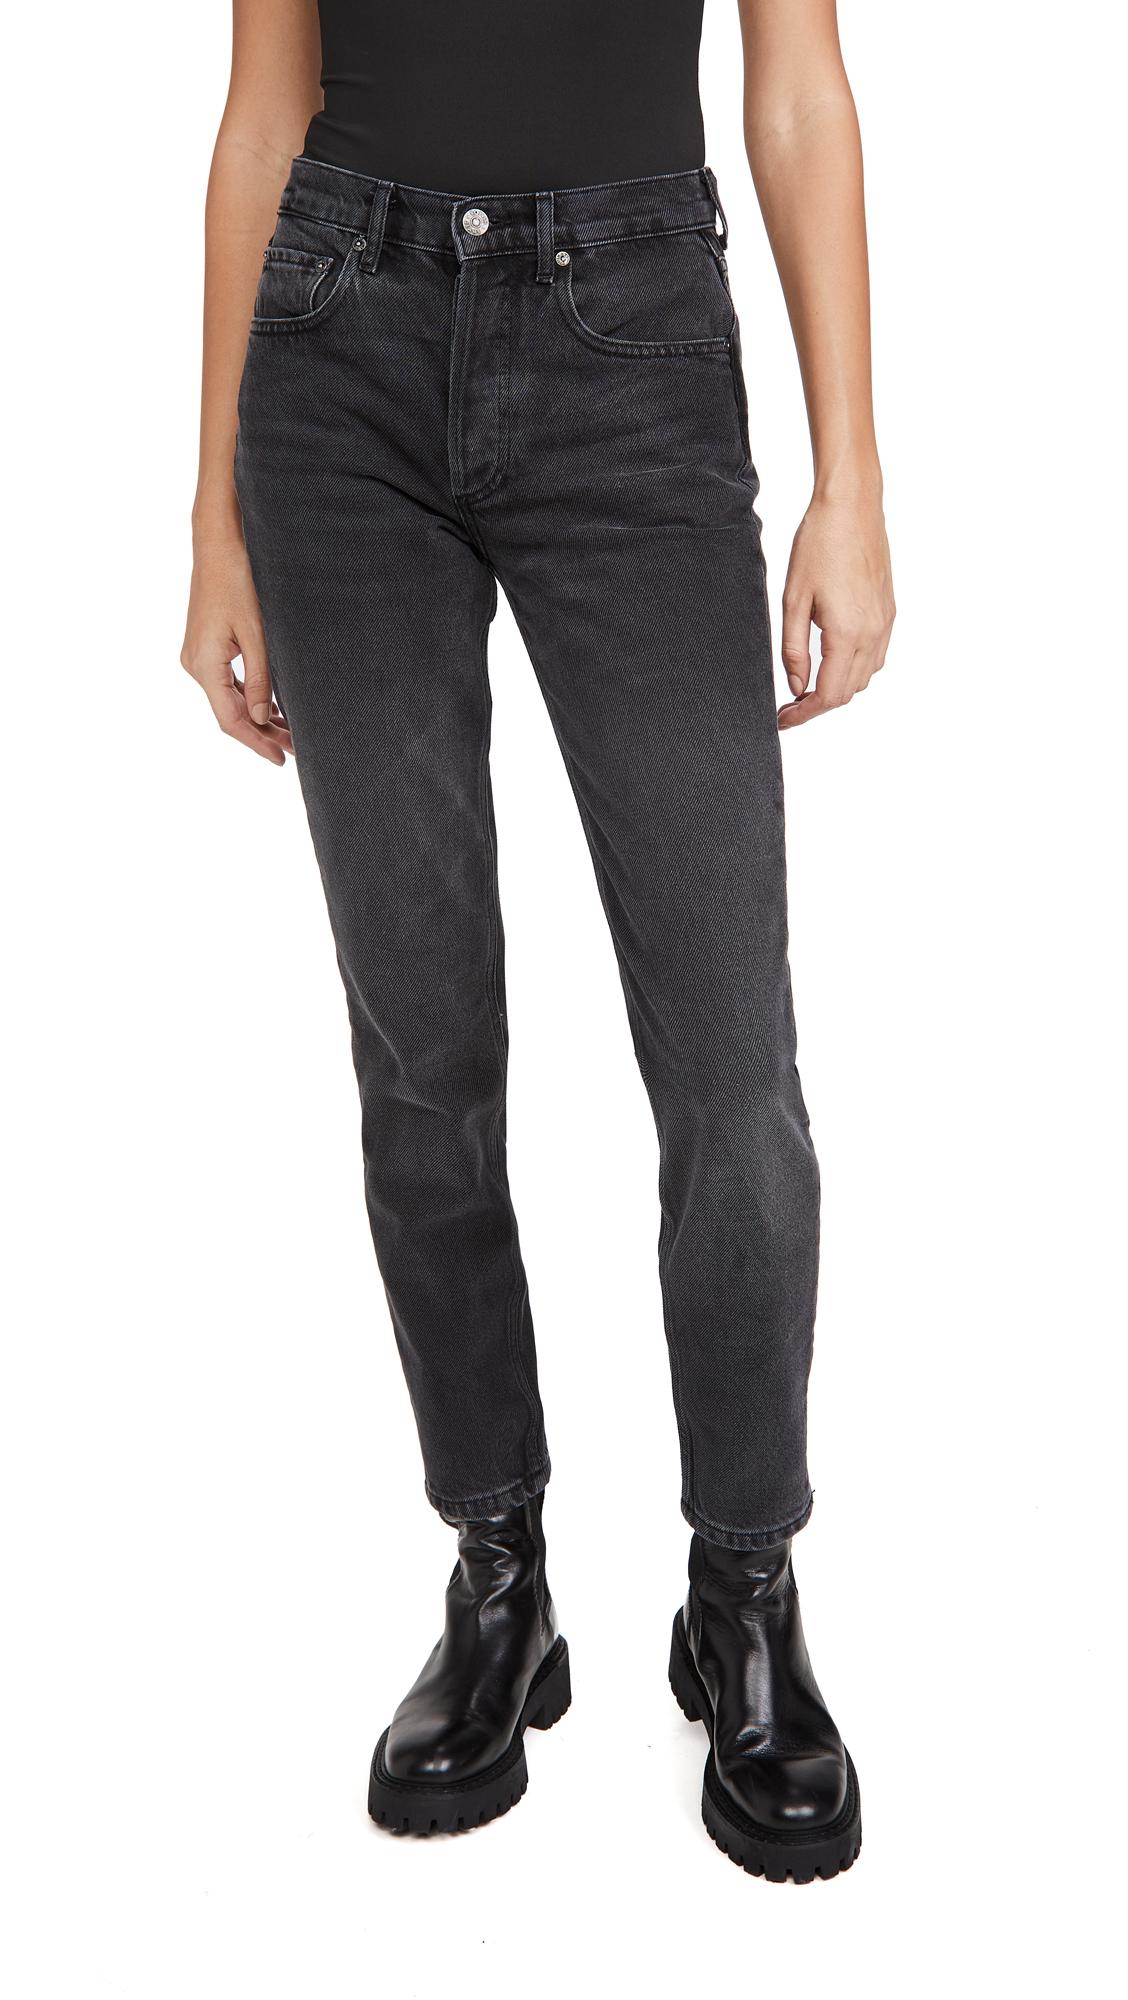 Boyish The Billy Jeans